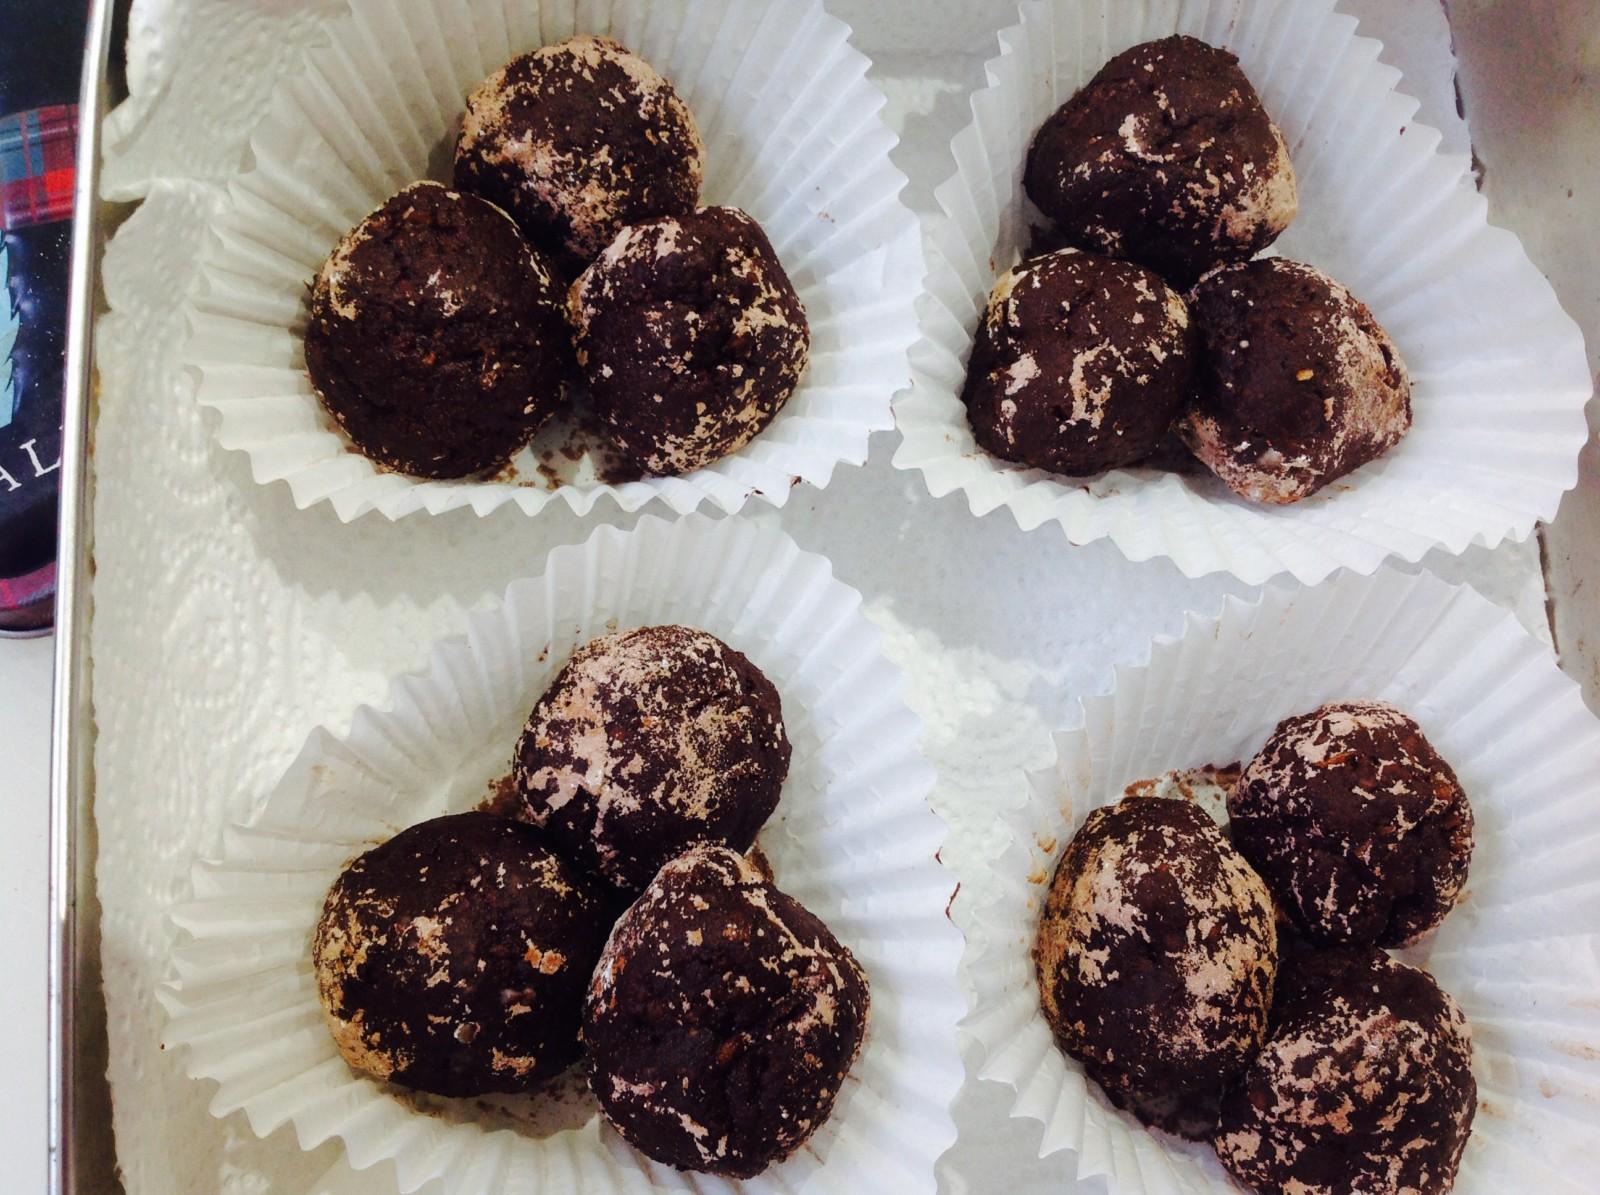 Walnut Nutella Ferraro Rocher type bites